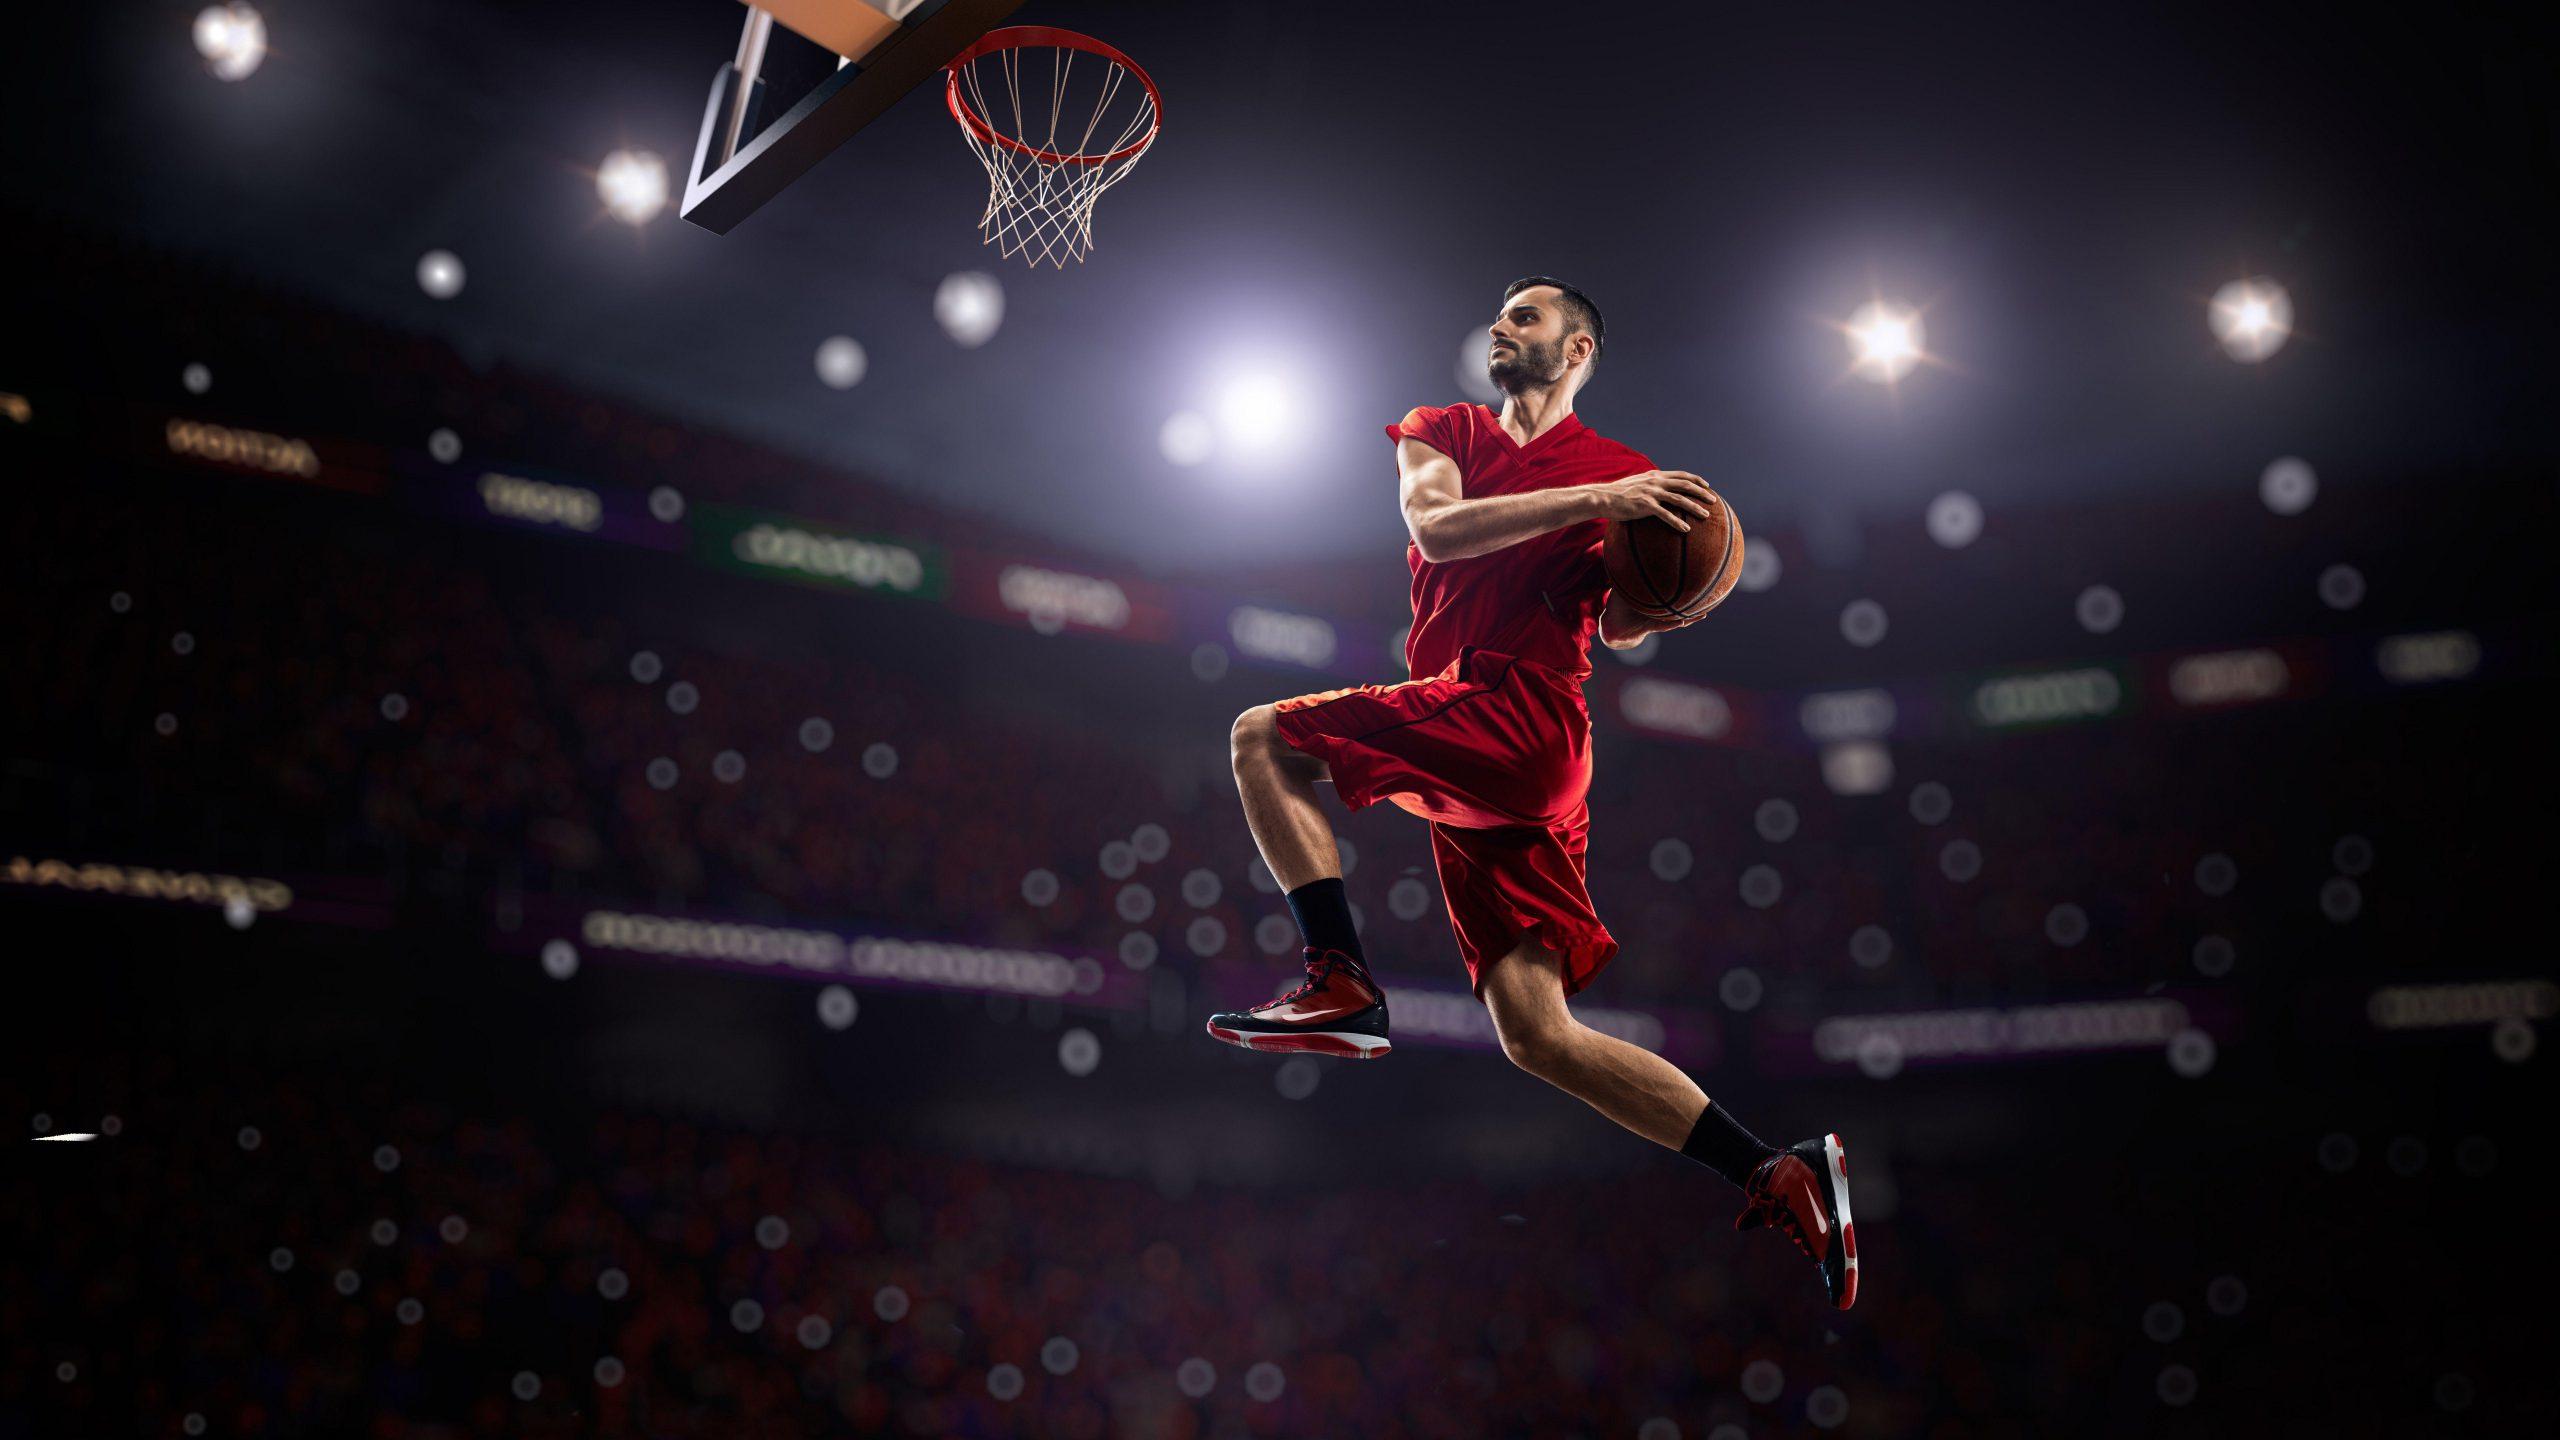 super jumping Basketball Wallpapers